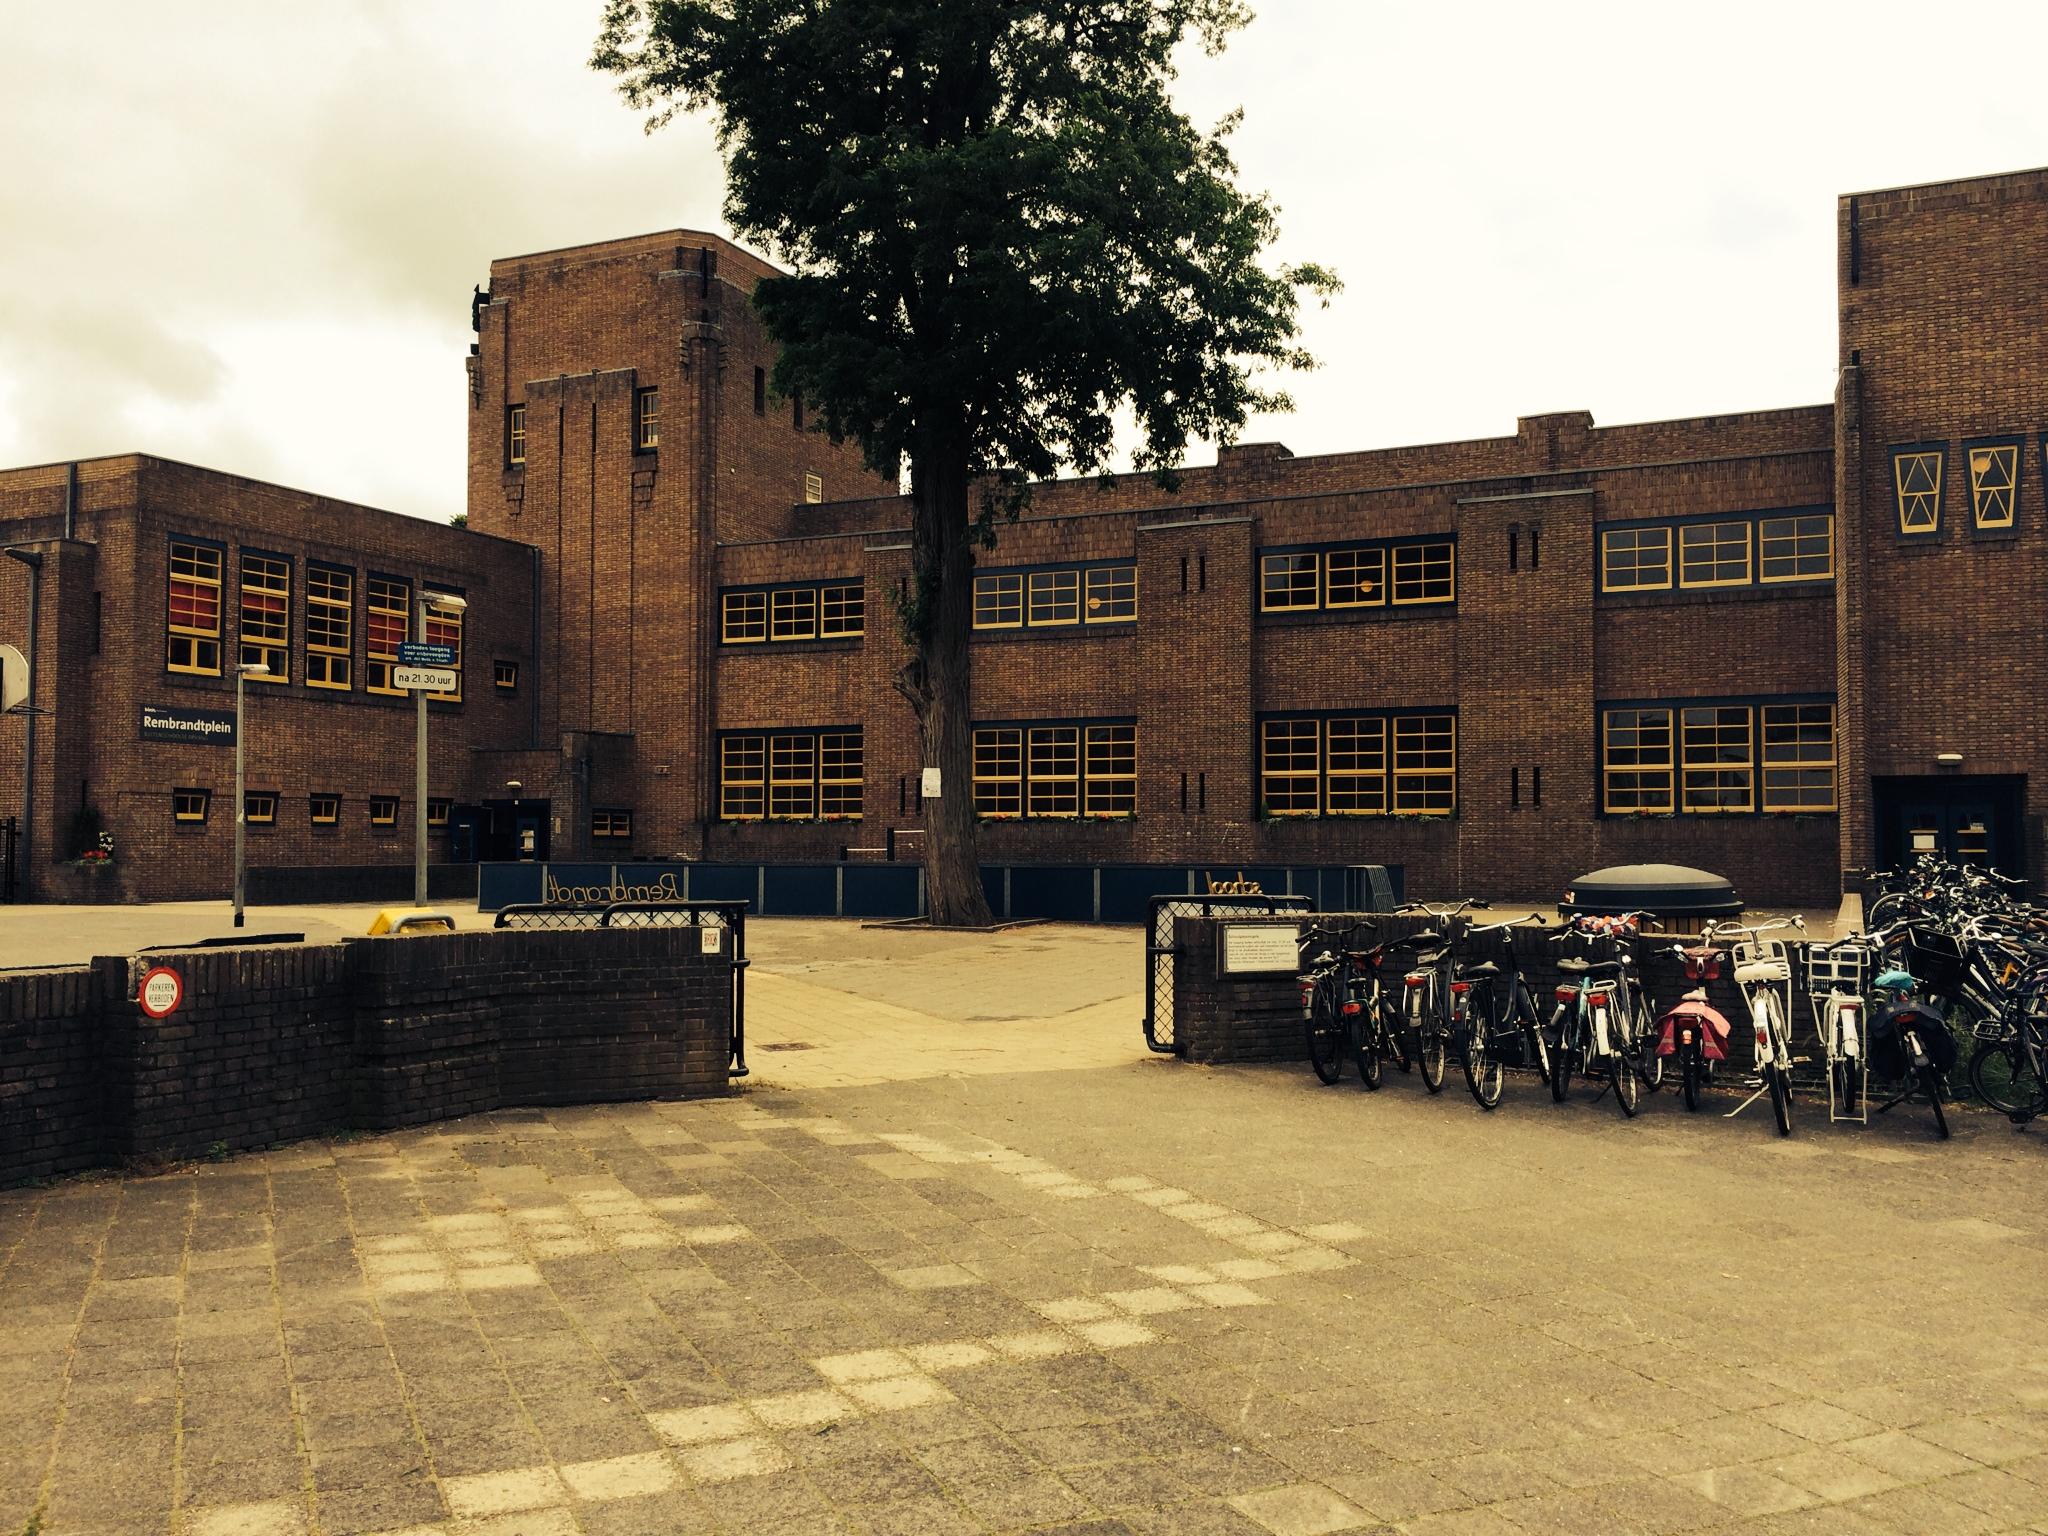 IPS - Hilversum (International Primary School)